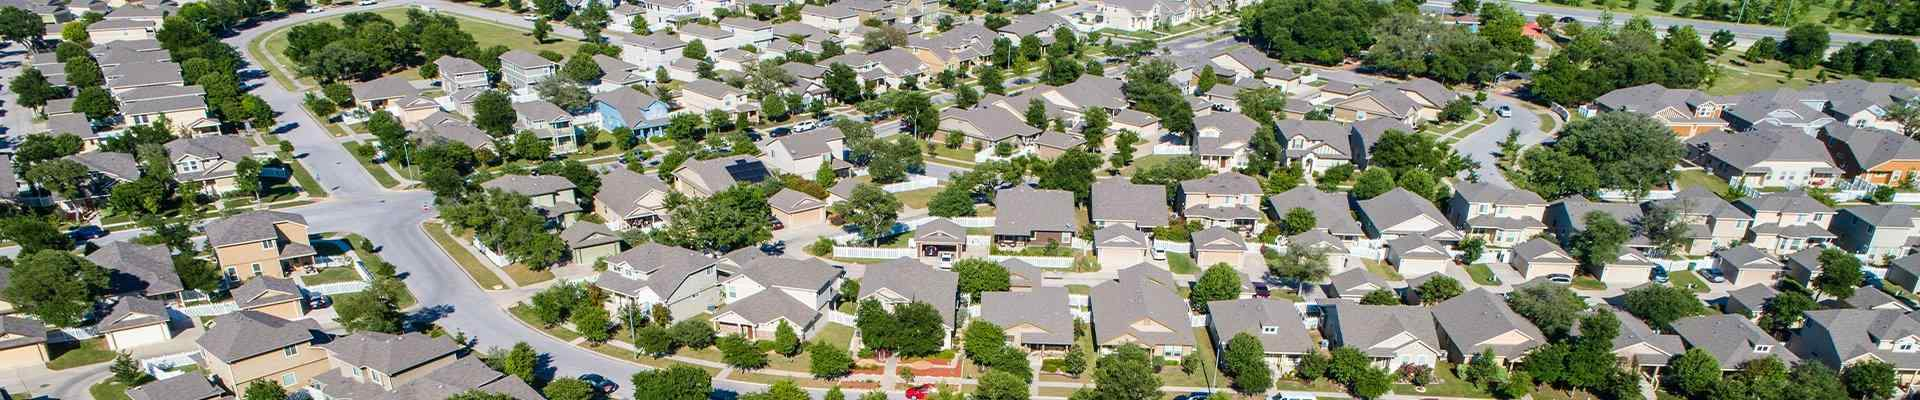 aerial view of mckinney texas